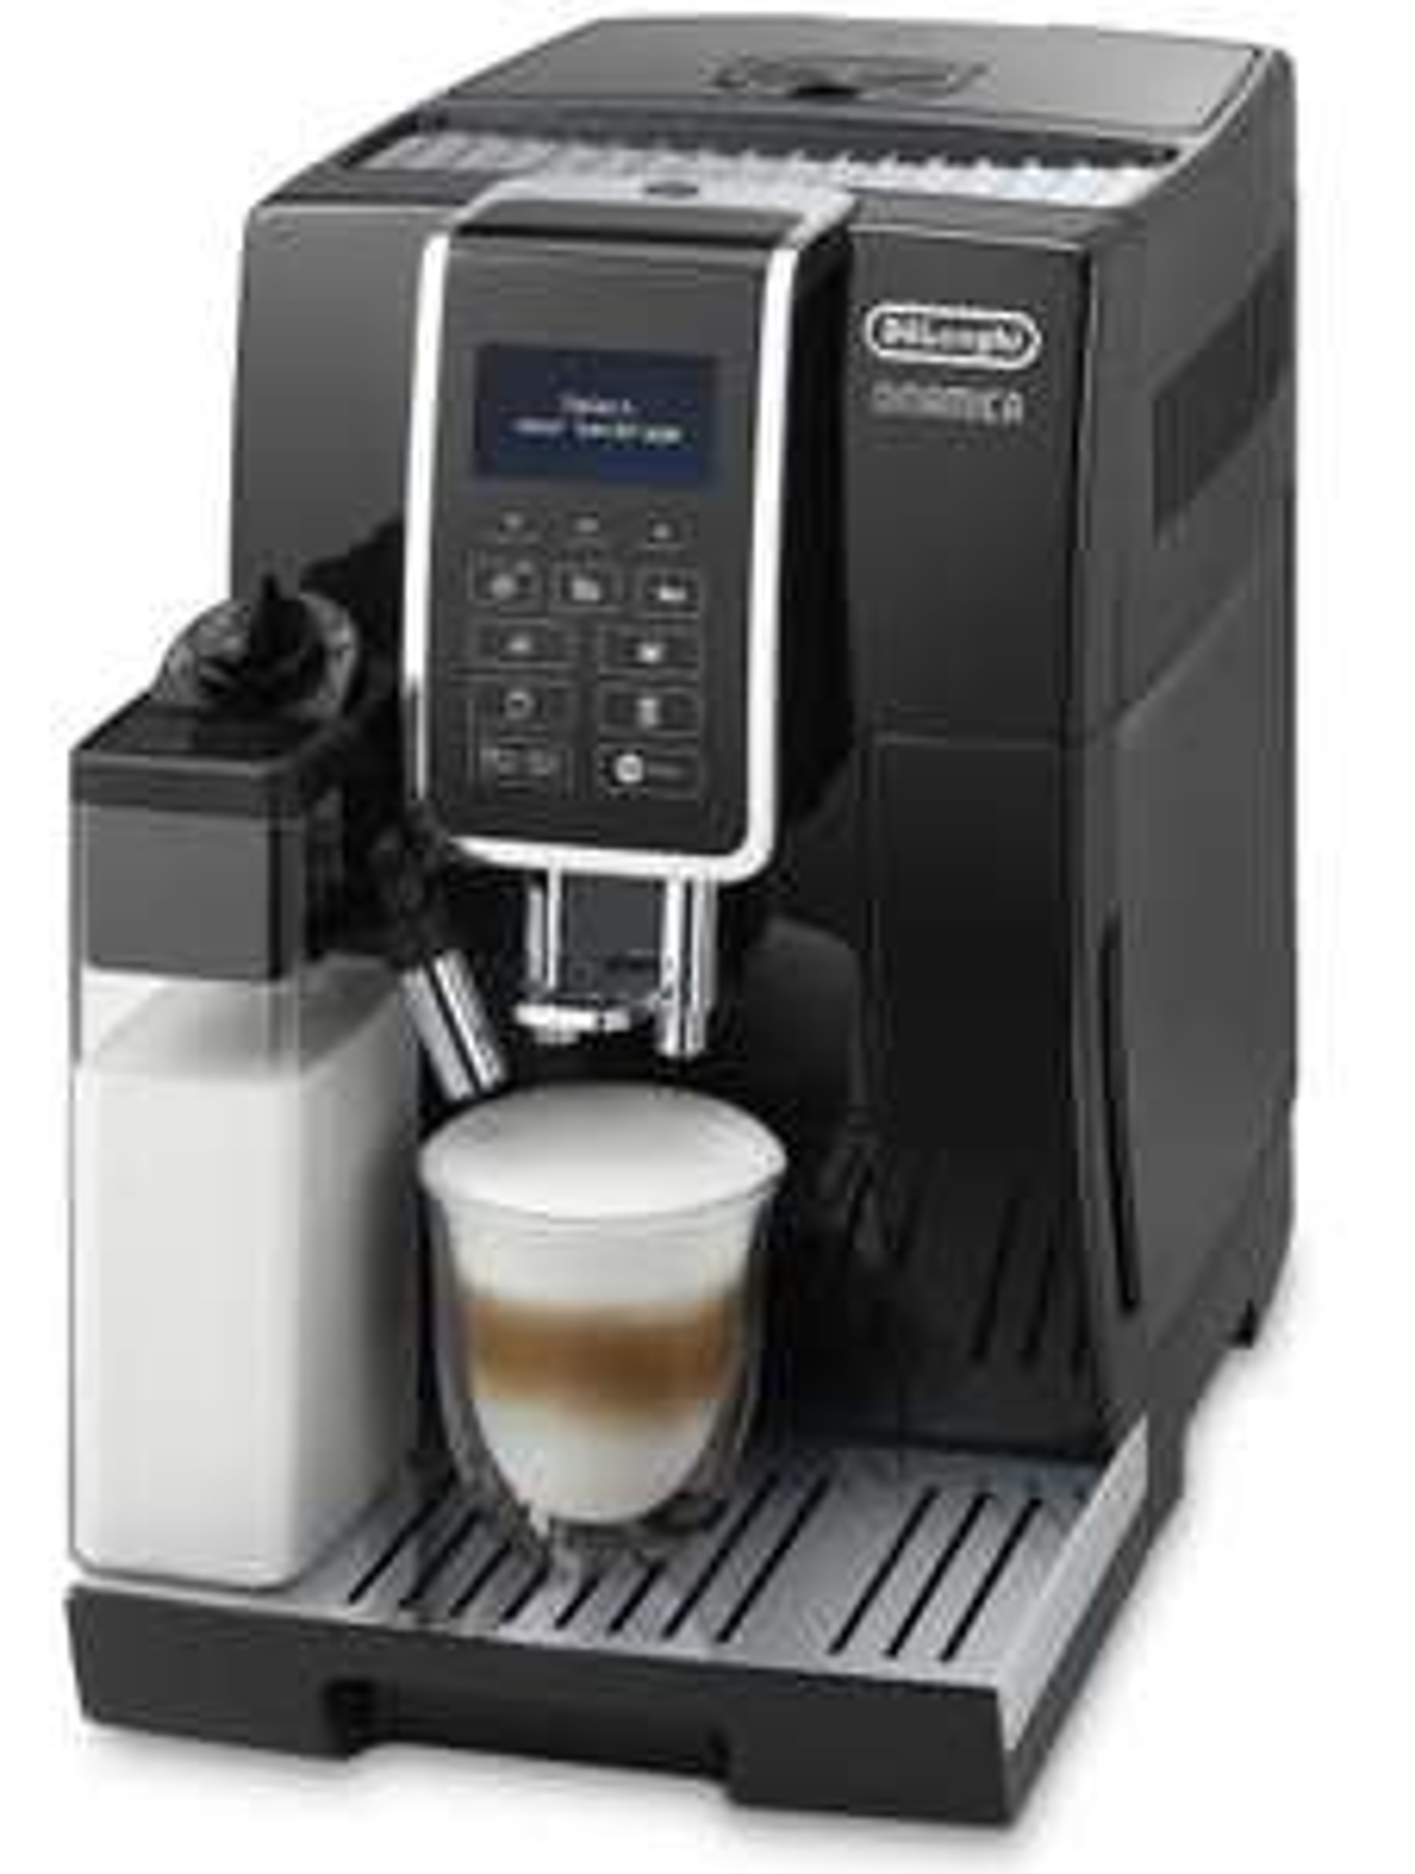 Machine à café Delonghi Dinamica 350.55.B